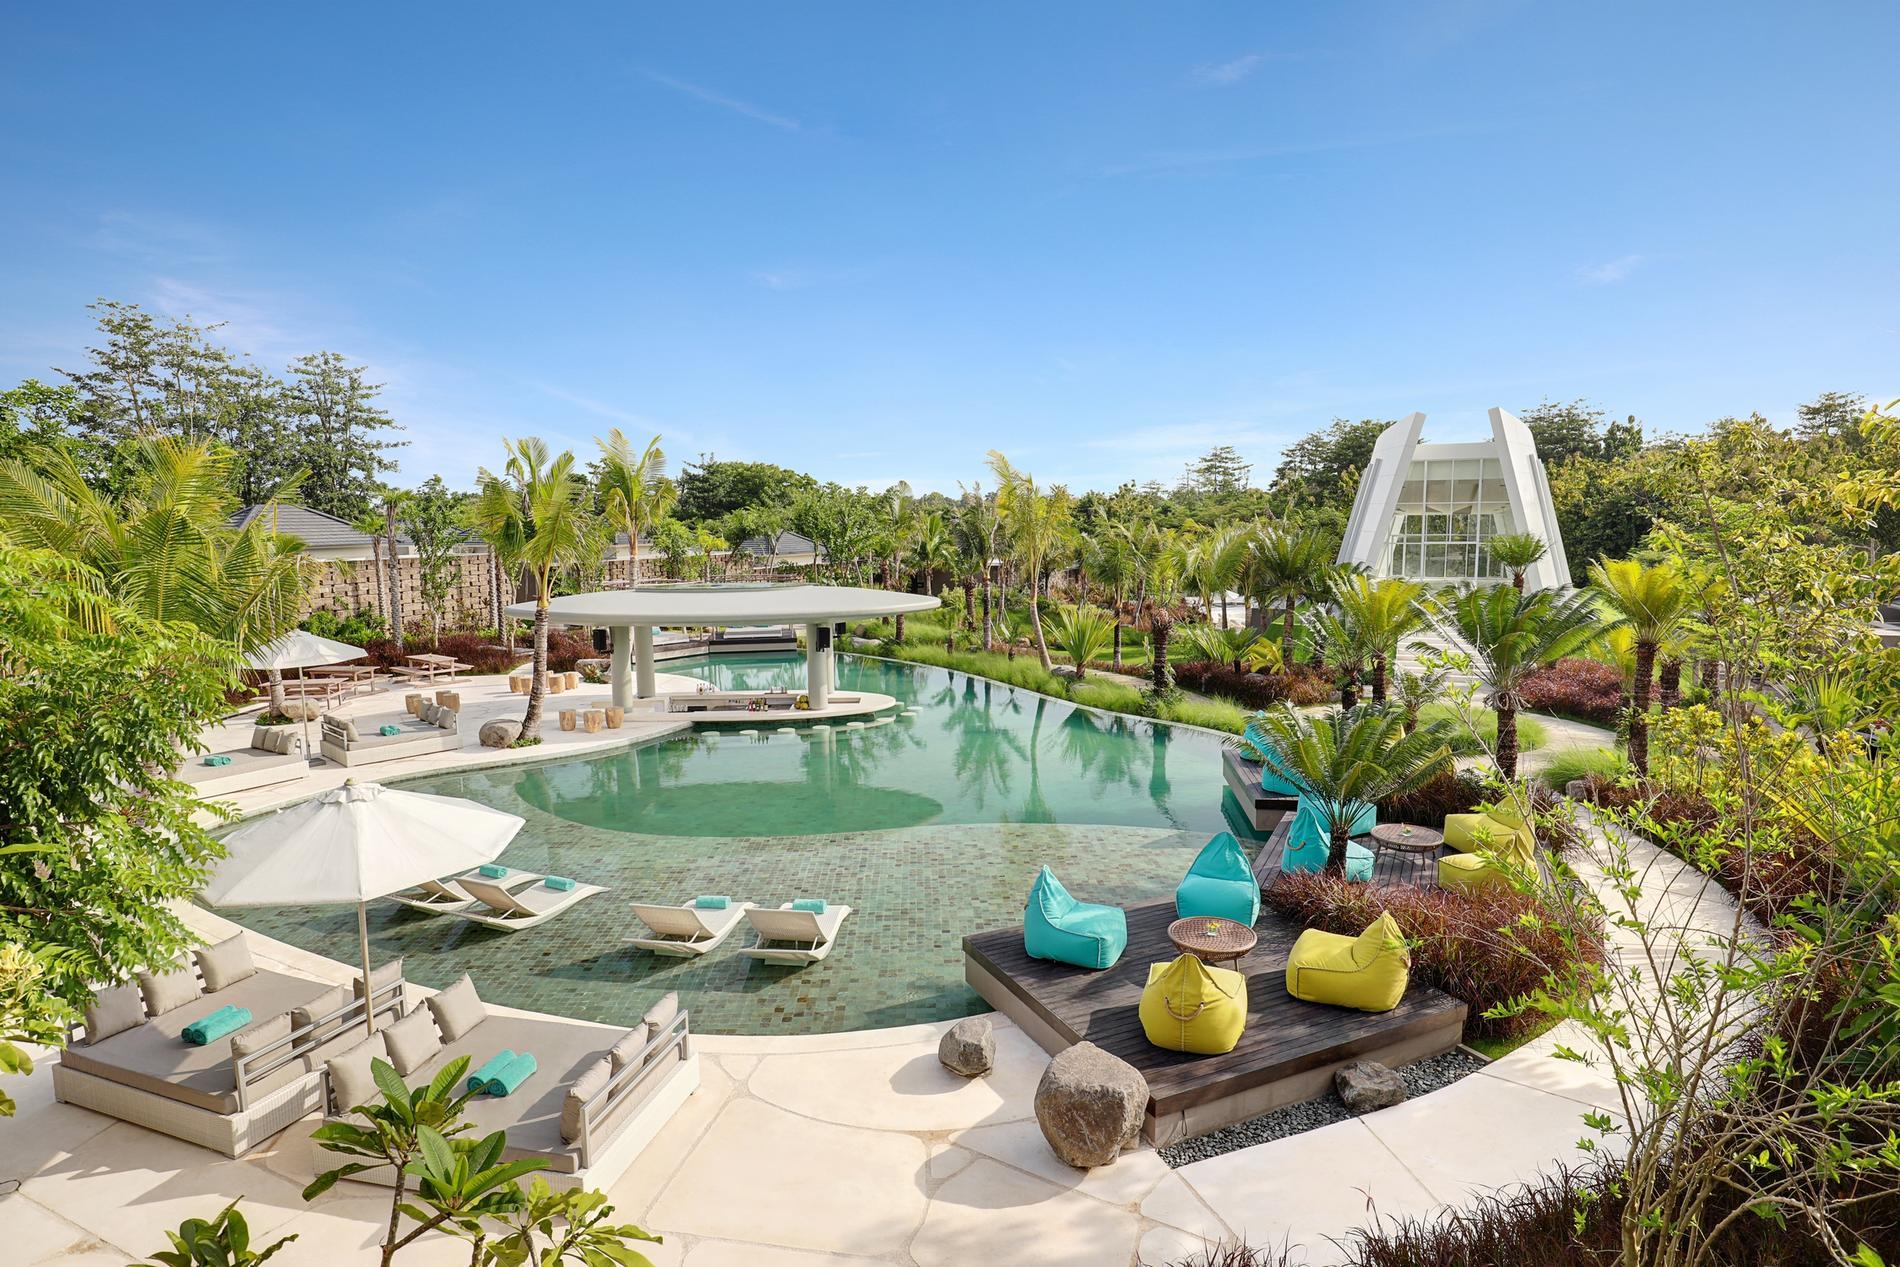 https://highend-traveller.com/the-newest-luxury-lifestyle-x2-bali-breakers-resort/